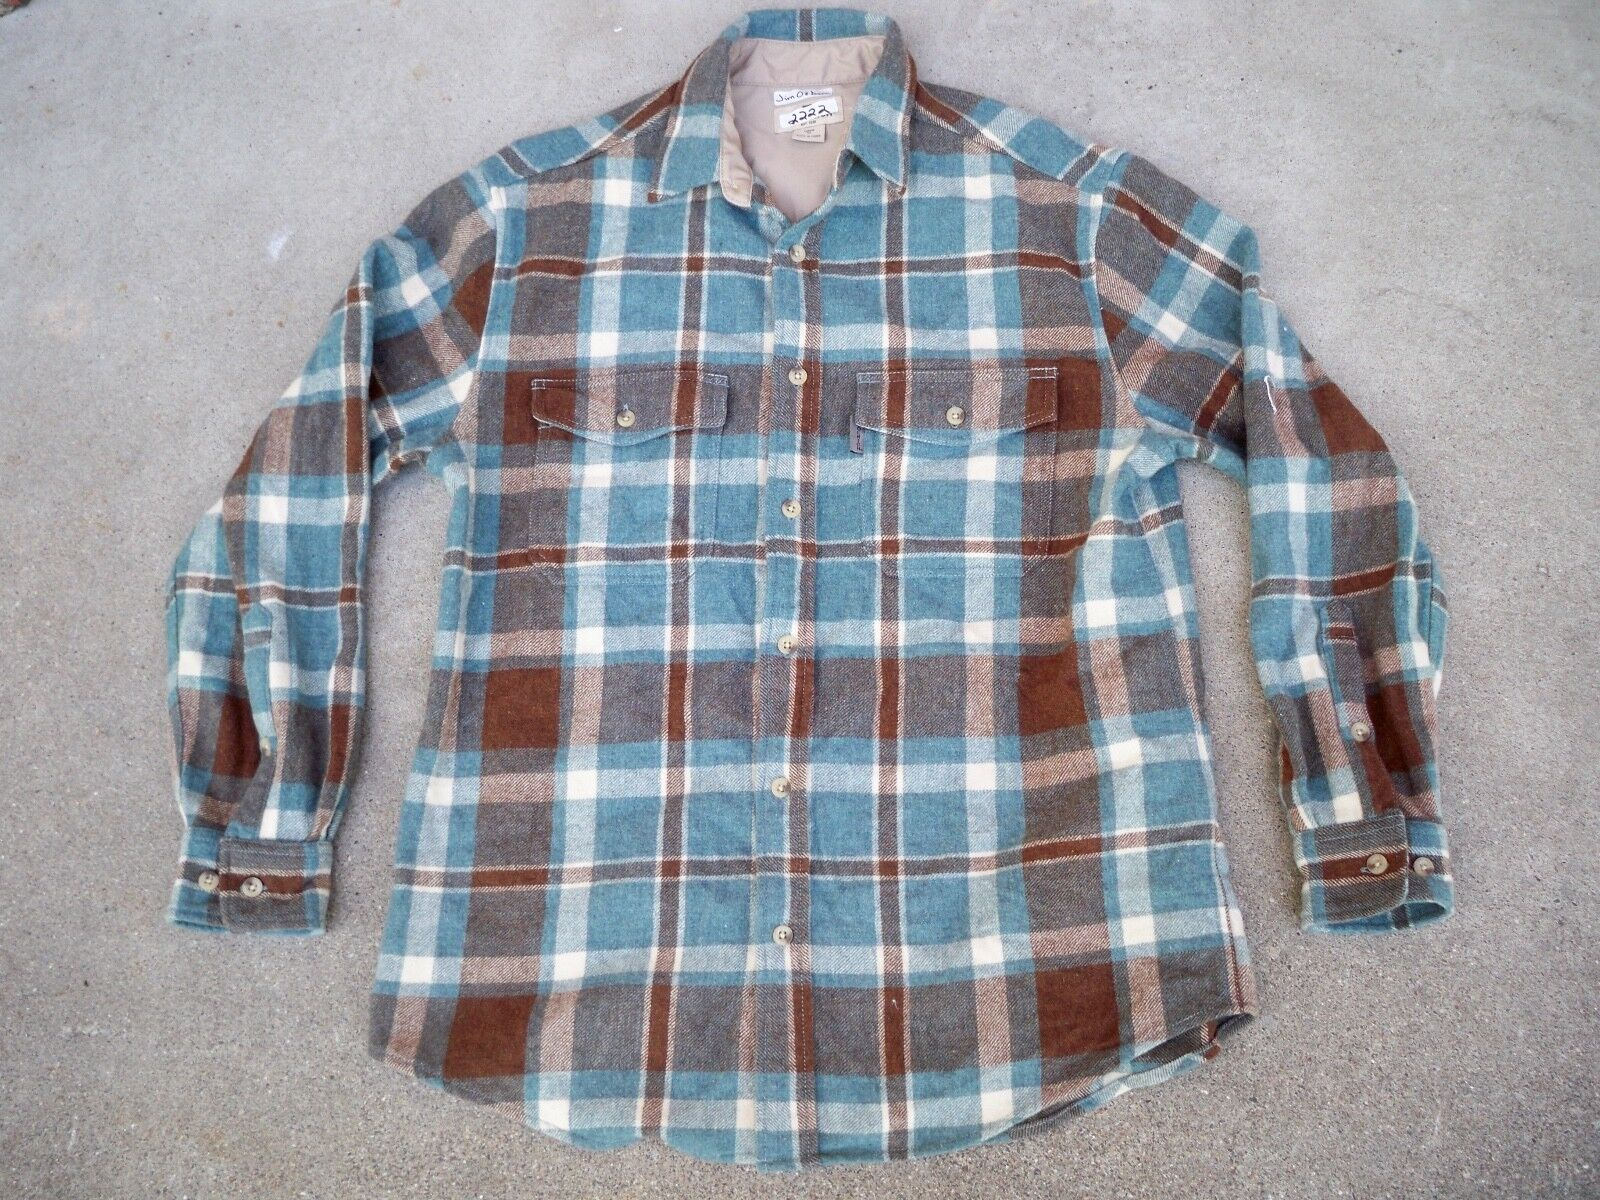 Woolrich Plaid Board Wool Hunting Work Jac Long Sleeve Shirt Men's Size Medium